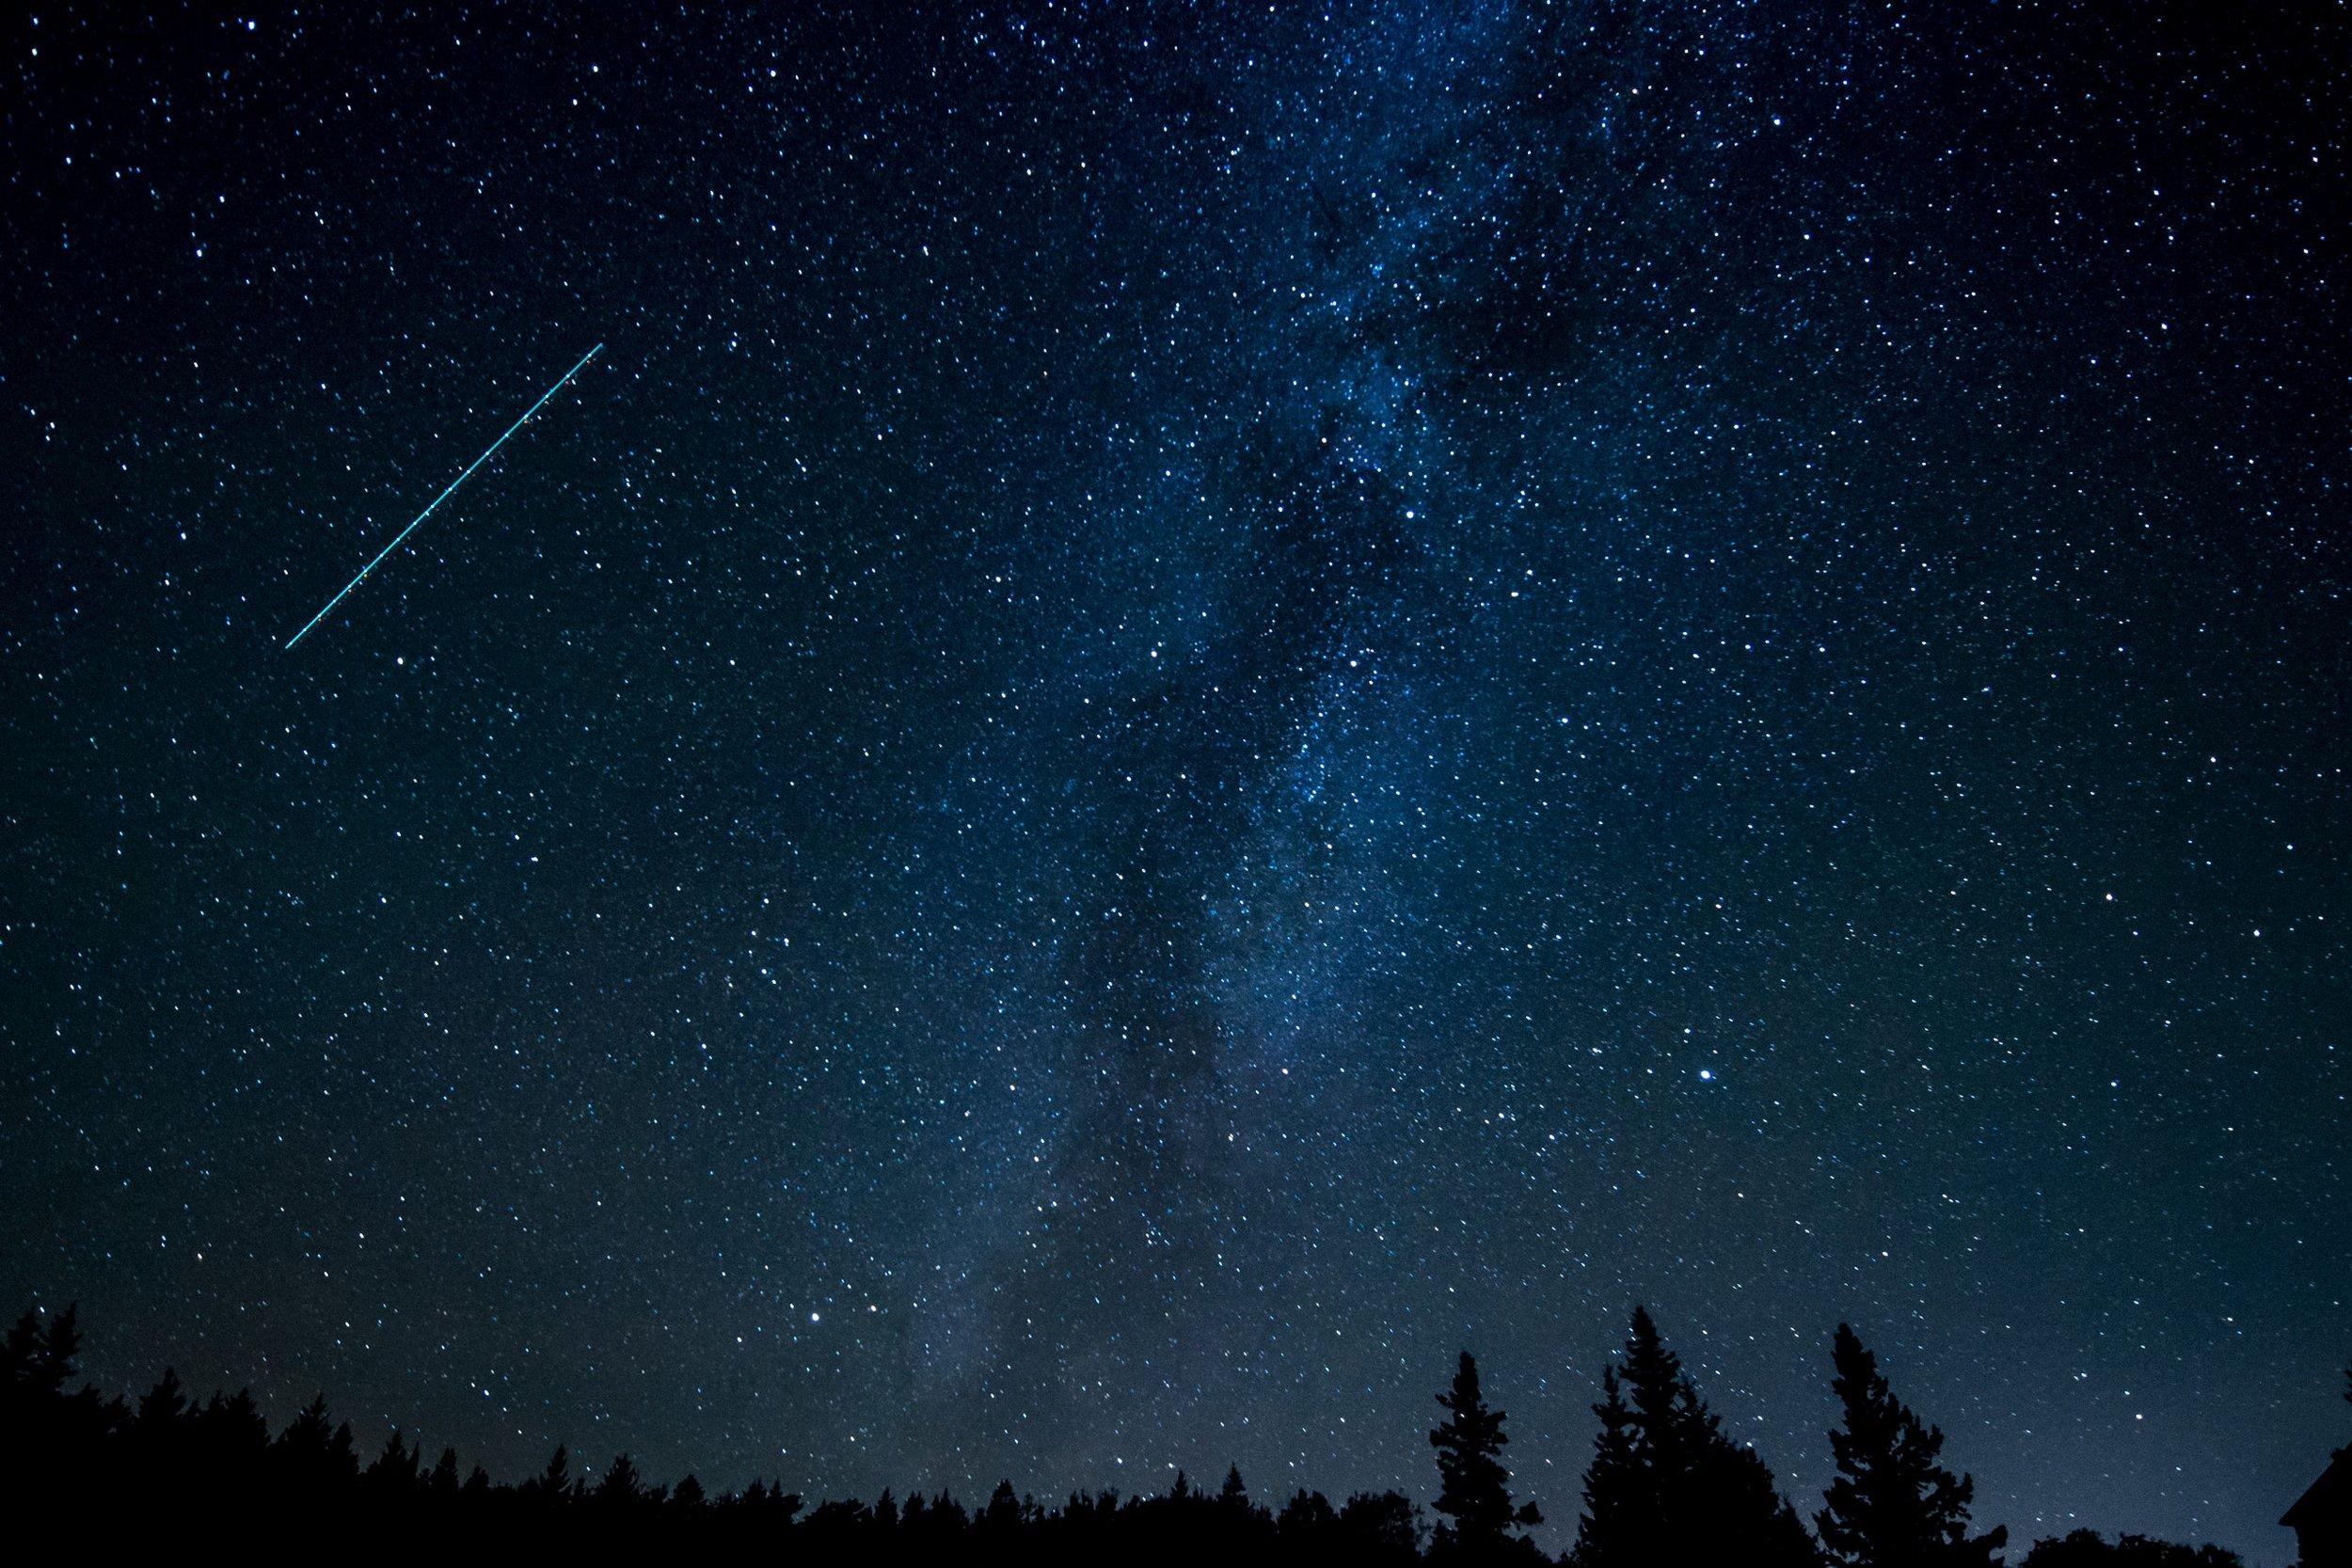 astronomy-comet-constellation-631477.jpg